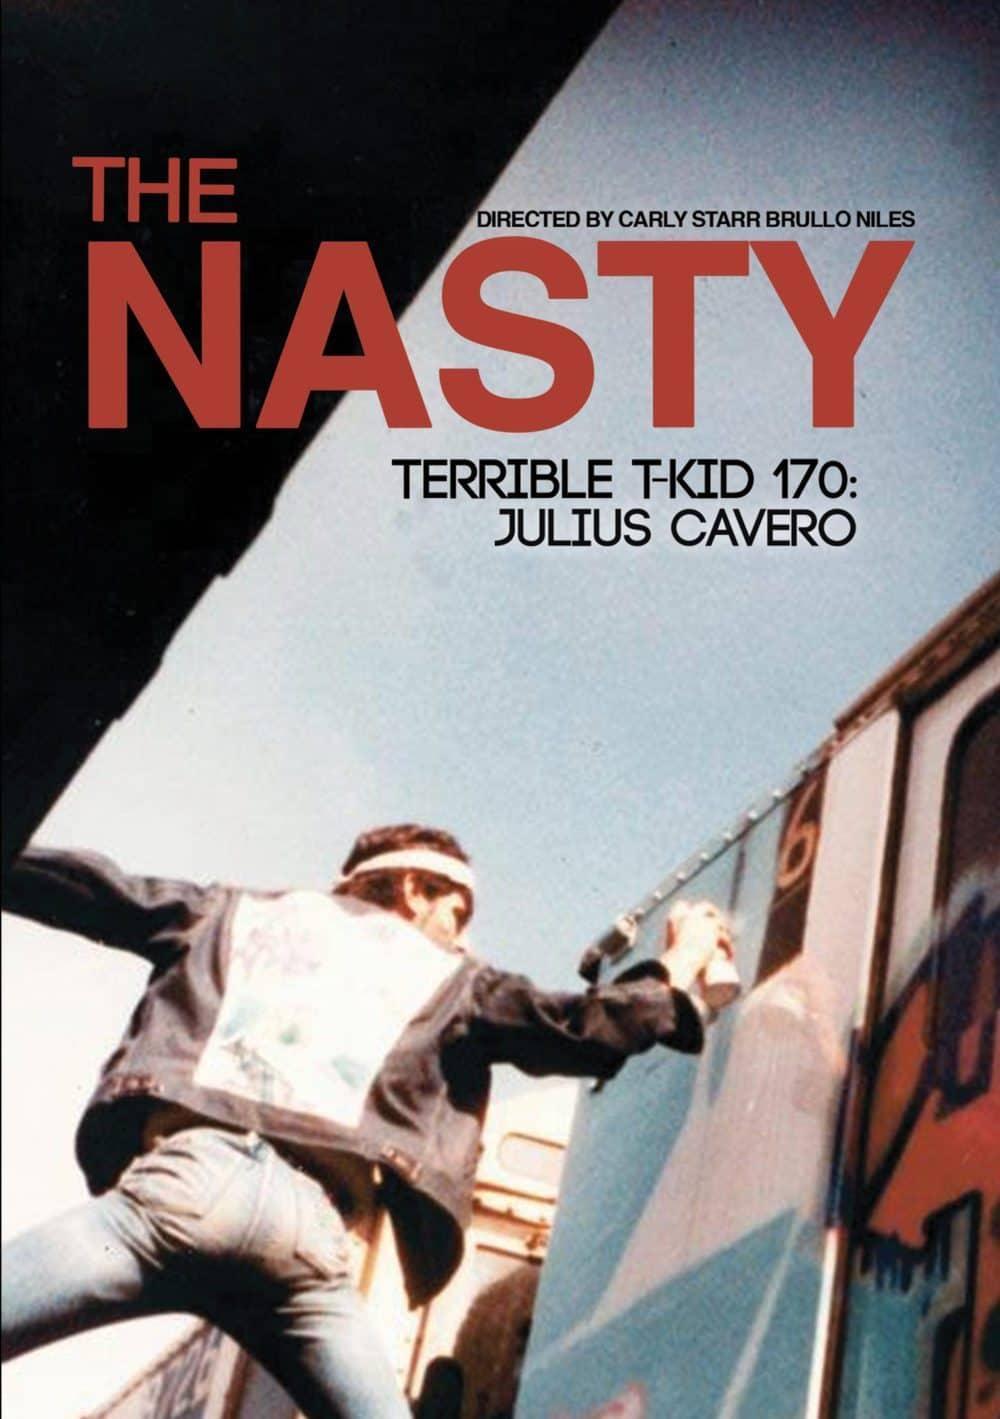 film reviews | movies | features | BRWC The Nasty TERRIBLE T-KID 170: Julius Cavero